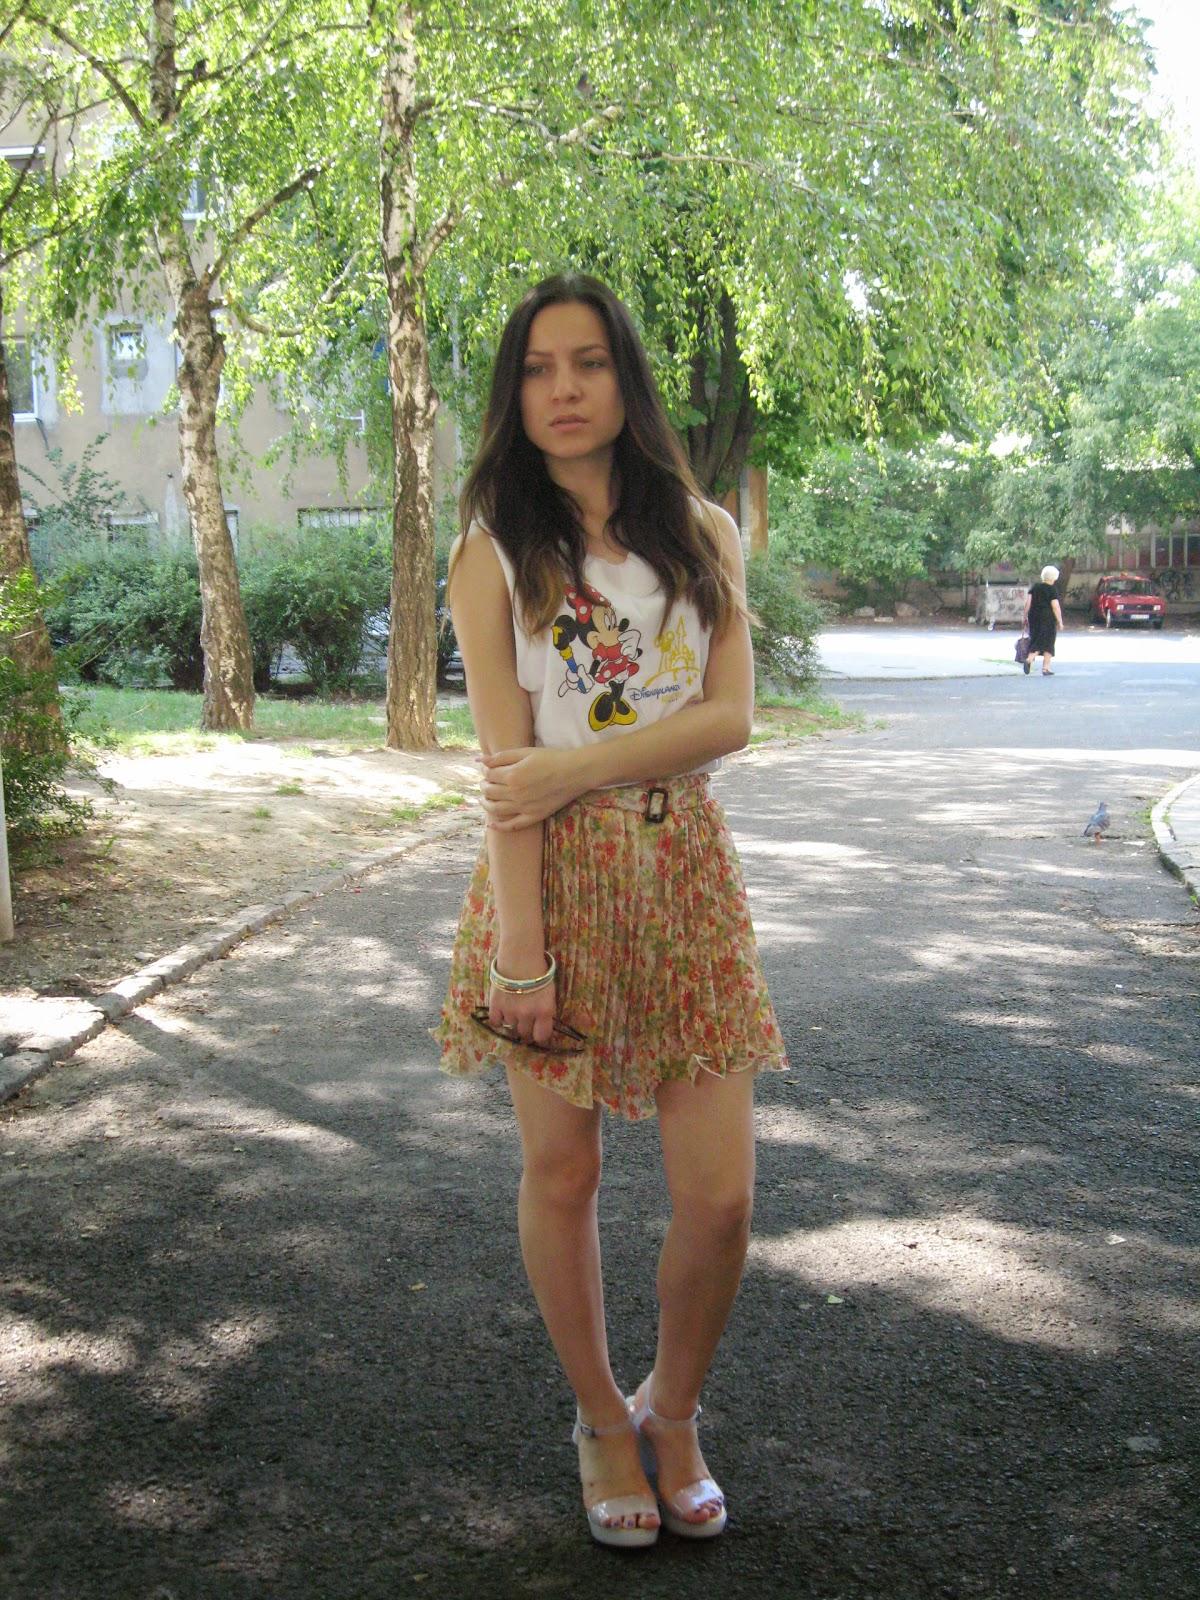 Disney minnie mouse t-shirt tee tank top, pleated floral short skirt, platform clear white straps sandals, avon colorful bracelets